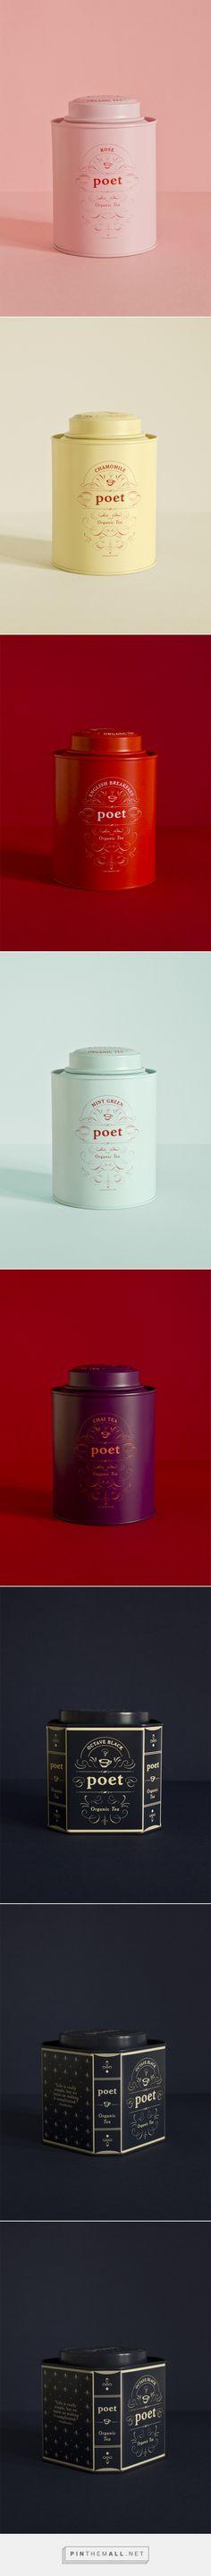 Studio Patten - Poet tea PACKAGING DESIGN World Packaging Design Society│Home of Packaging Design│Branding│Brand Design│CPG Design│FMCG Design - created via https://pinthemall.net